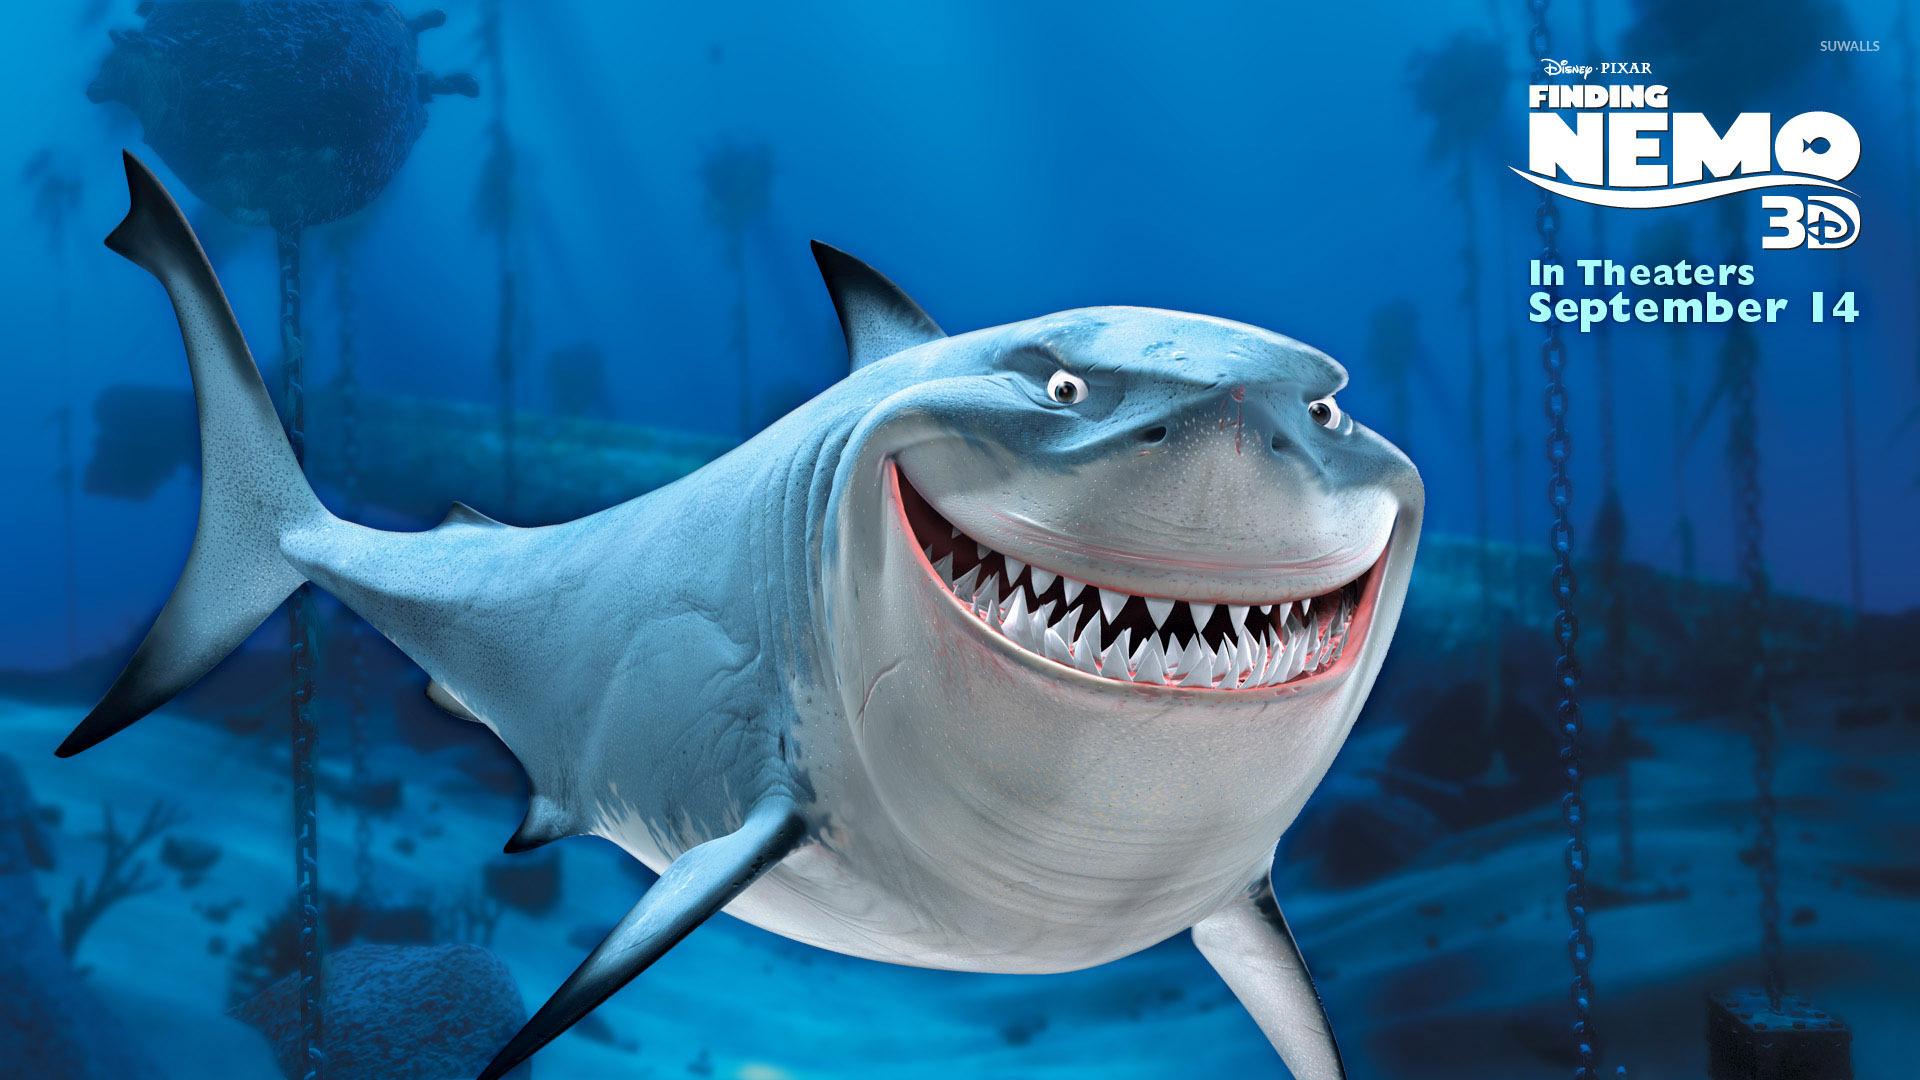 Hd Great White Shark Wallpaper Bruce From Finding Nemo Wallpaper Cartoon Wallpapers